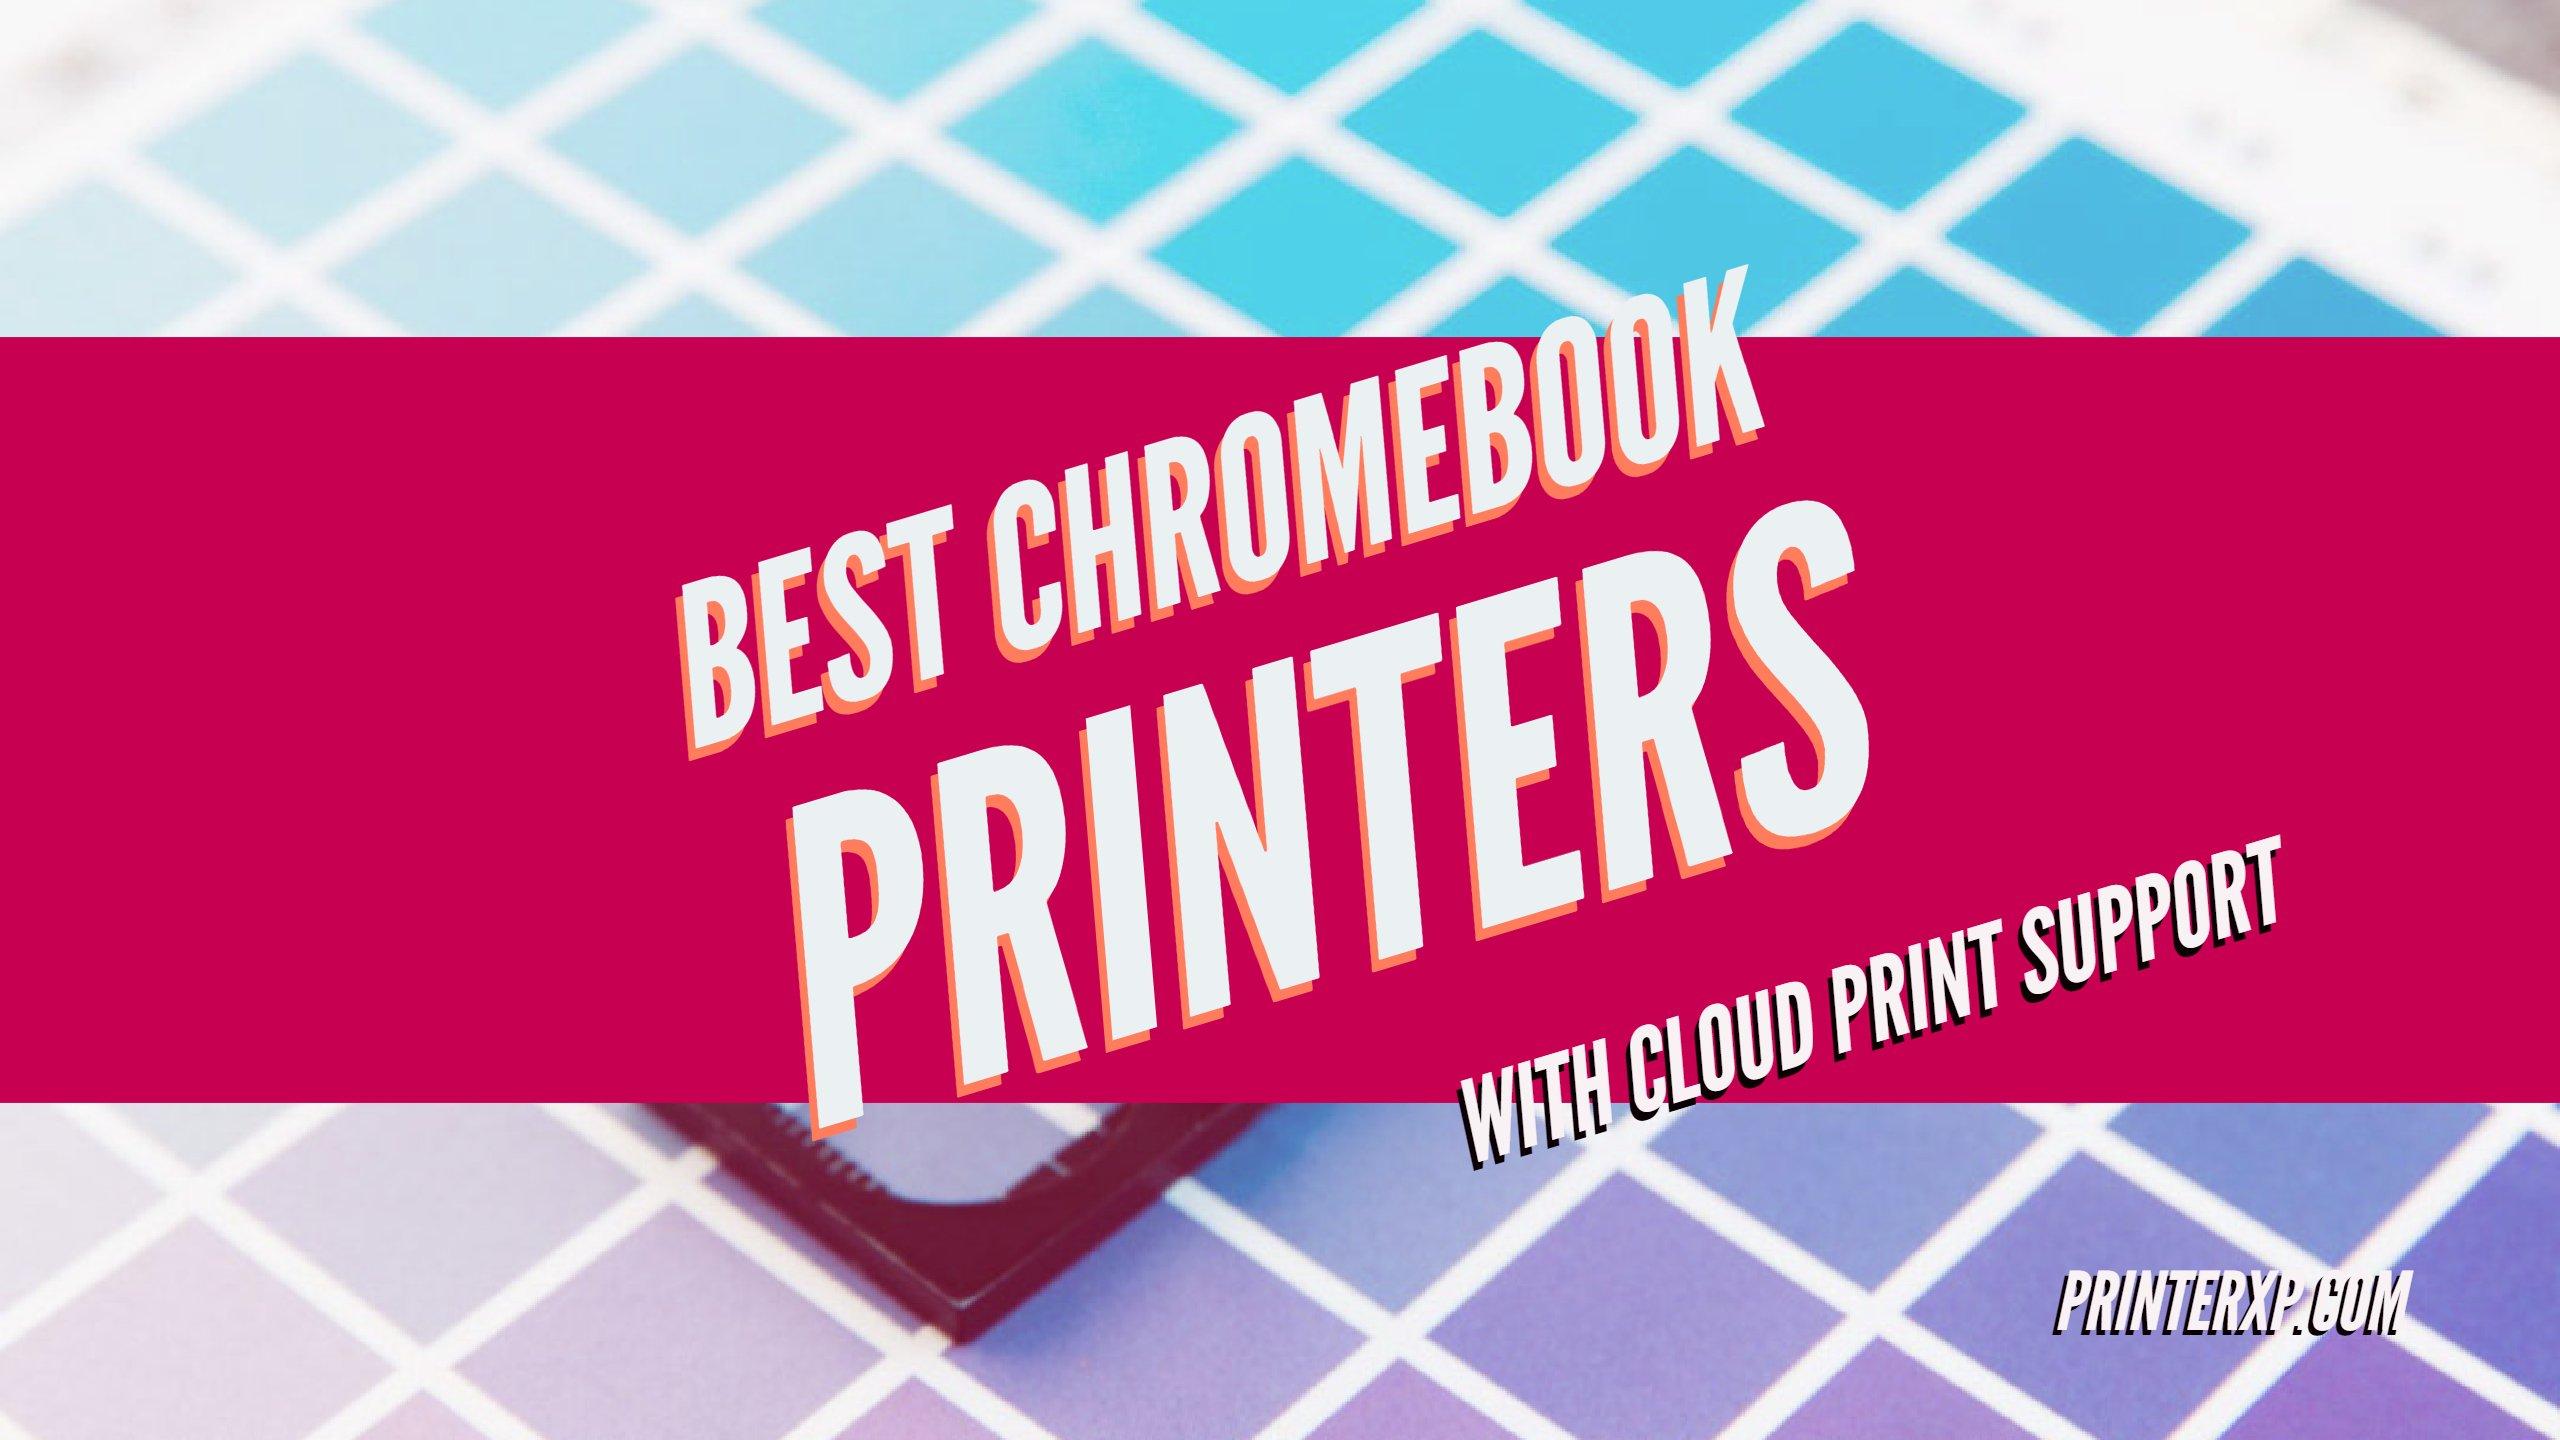 Best Chromebook Compatible Printers